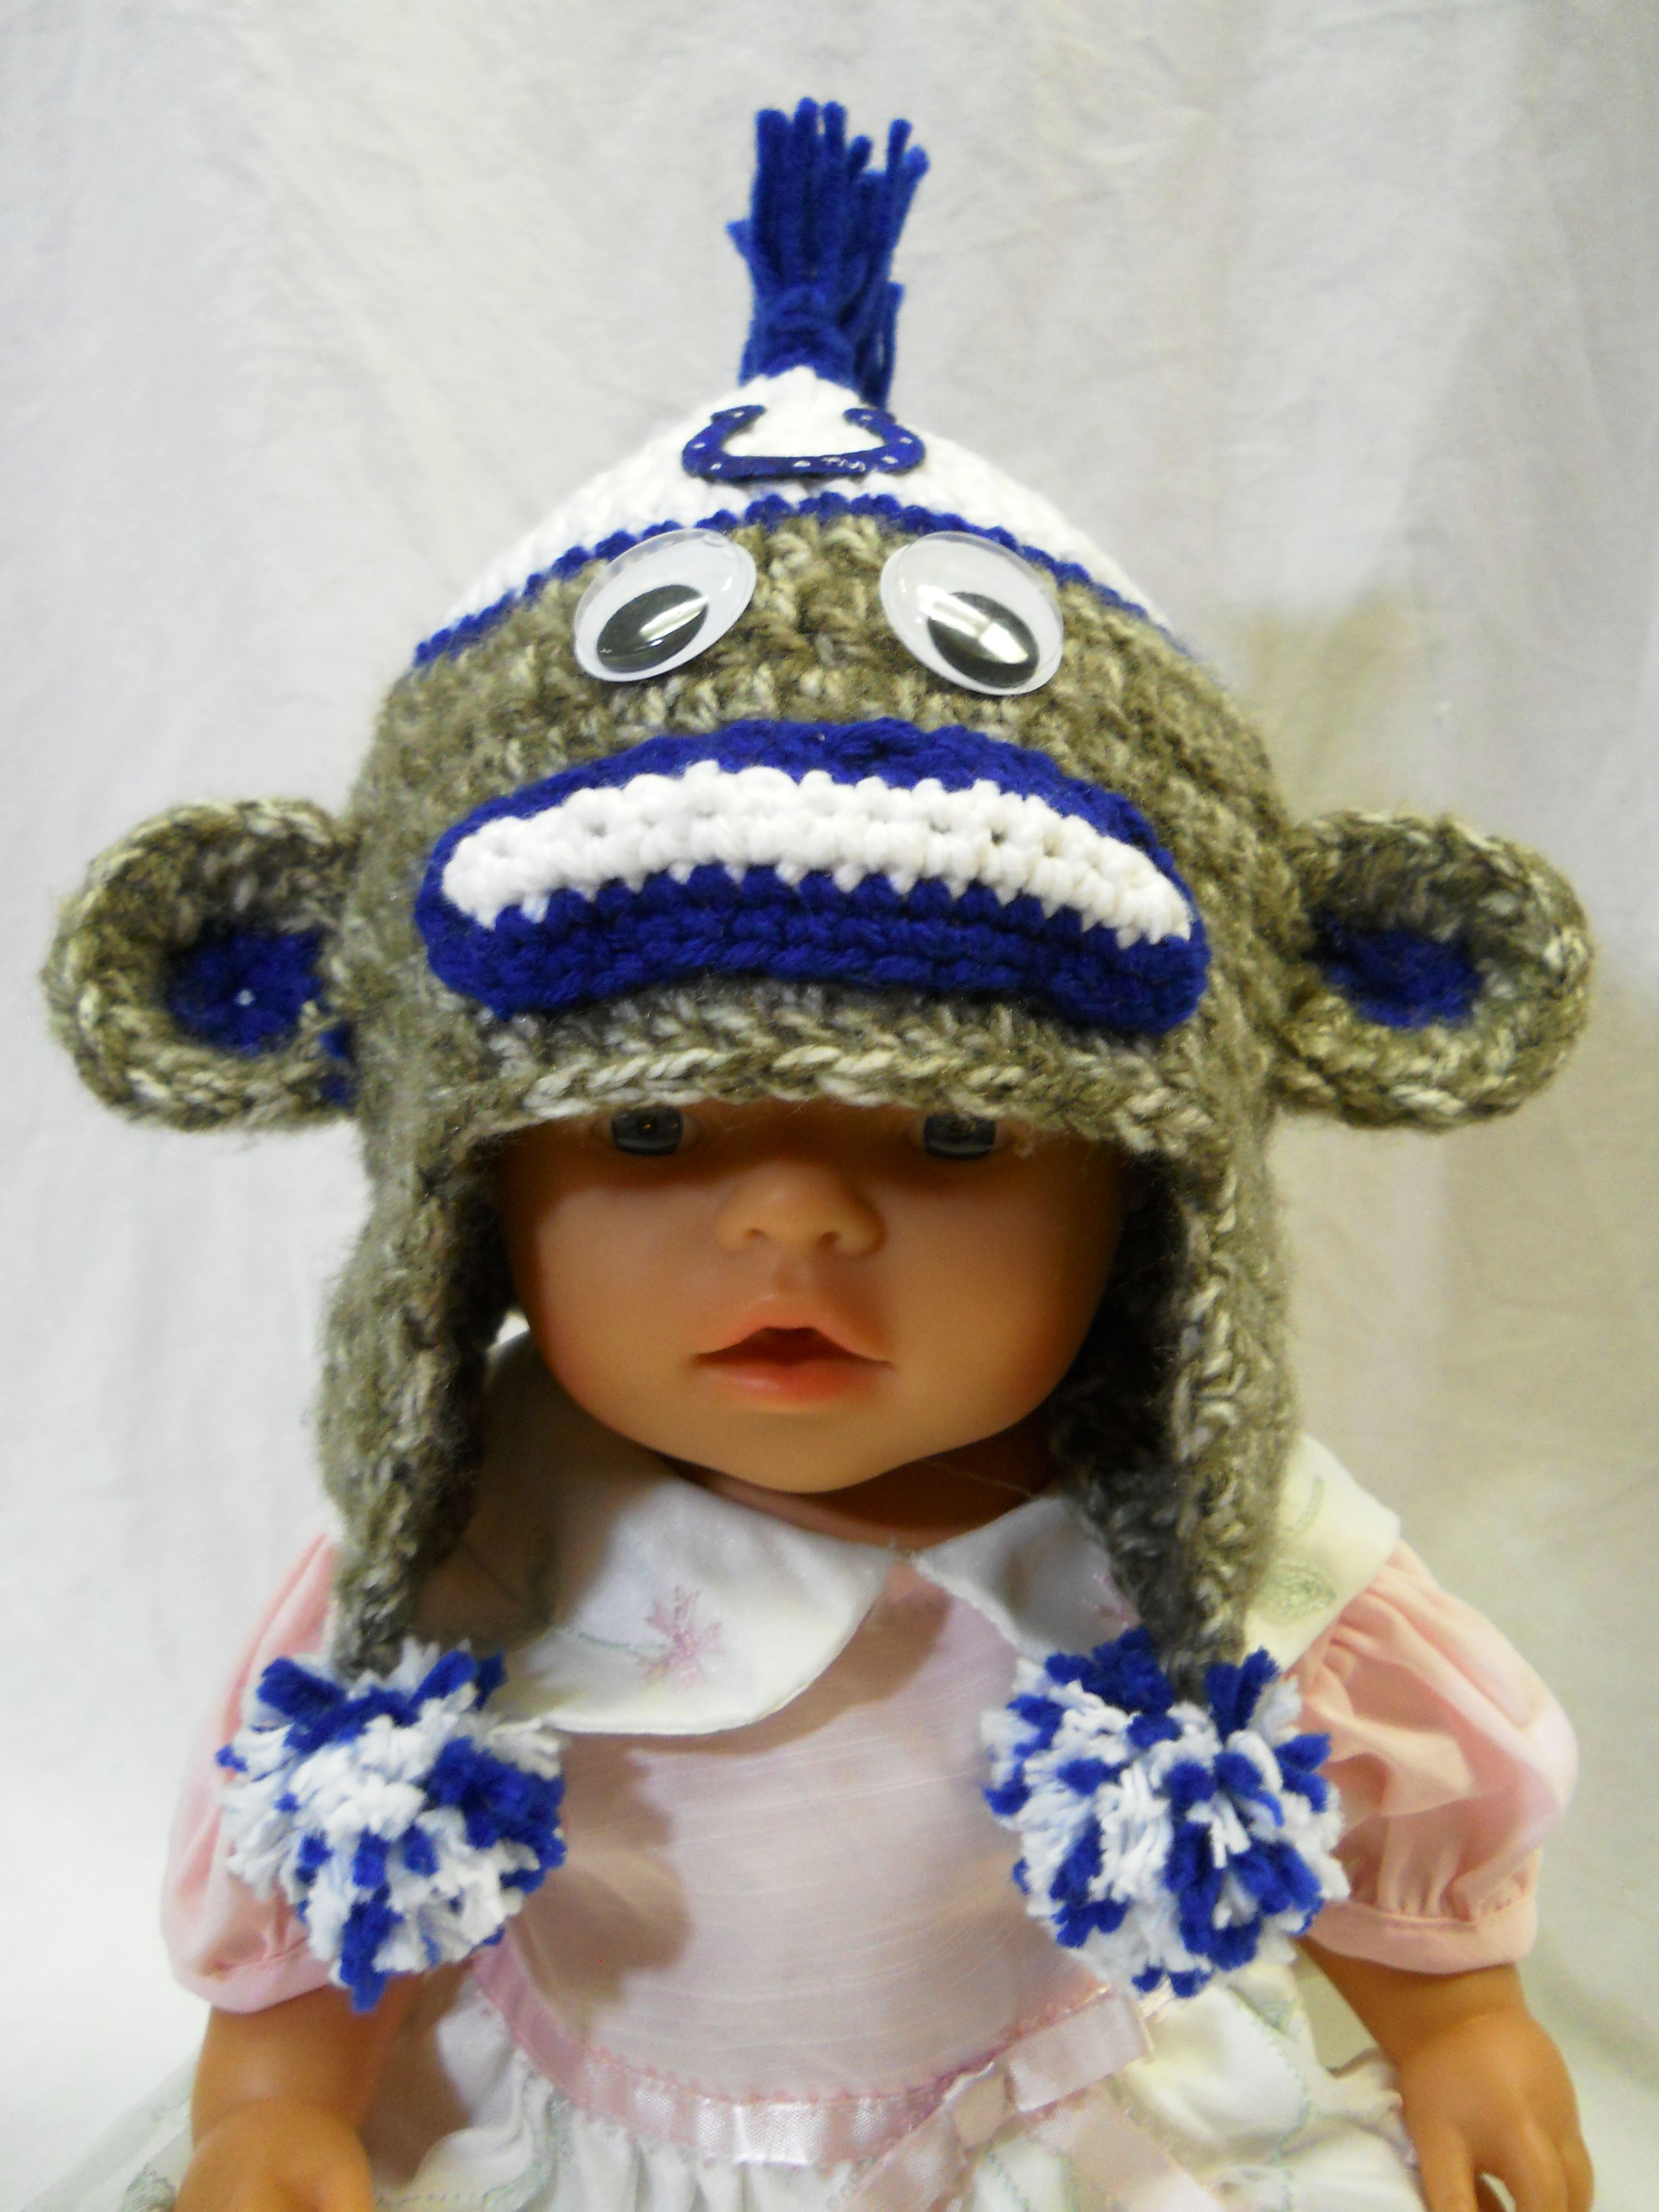 a1a70968dae Crochet Colts Sock Monkey Hat Crochet Socks